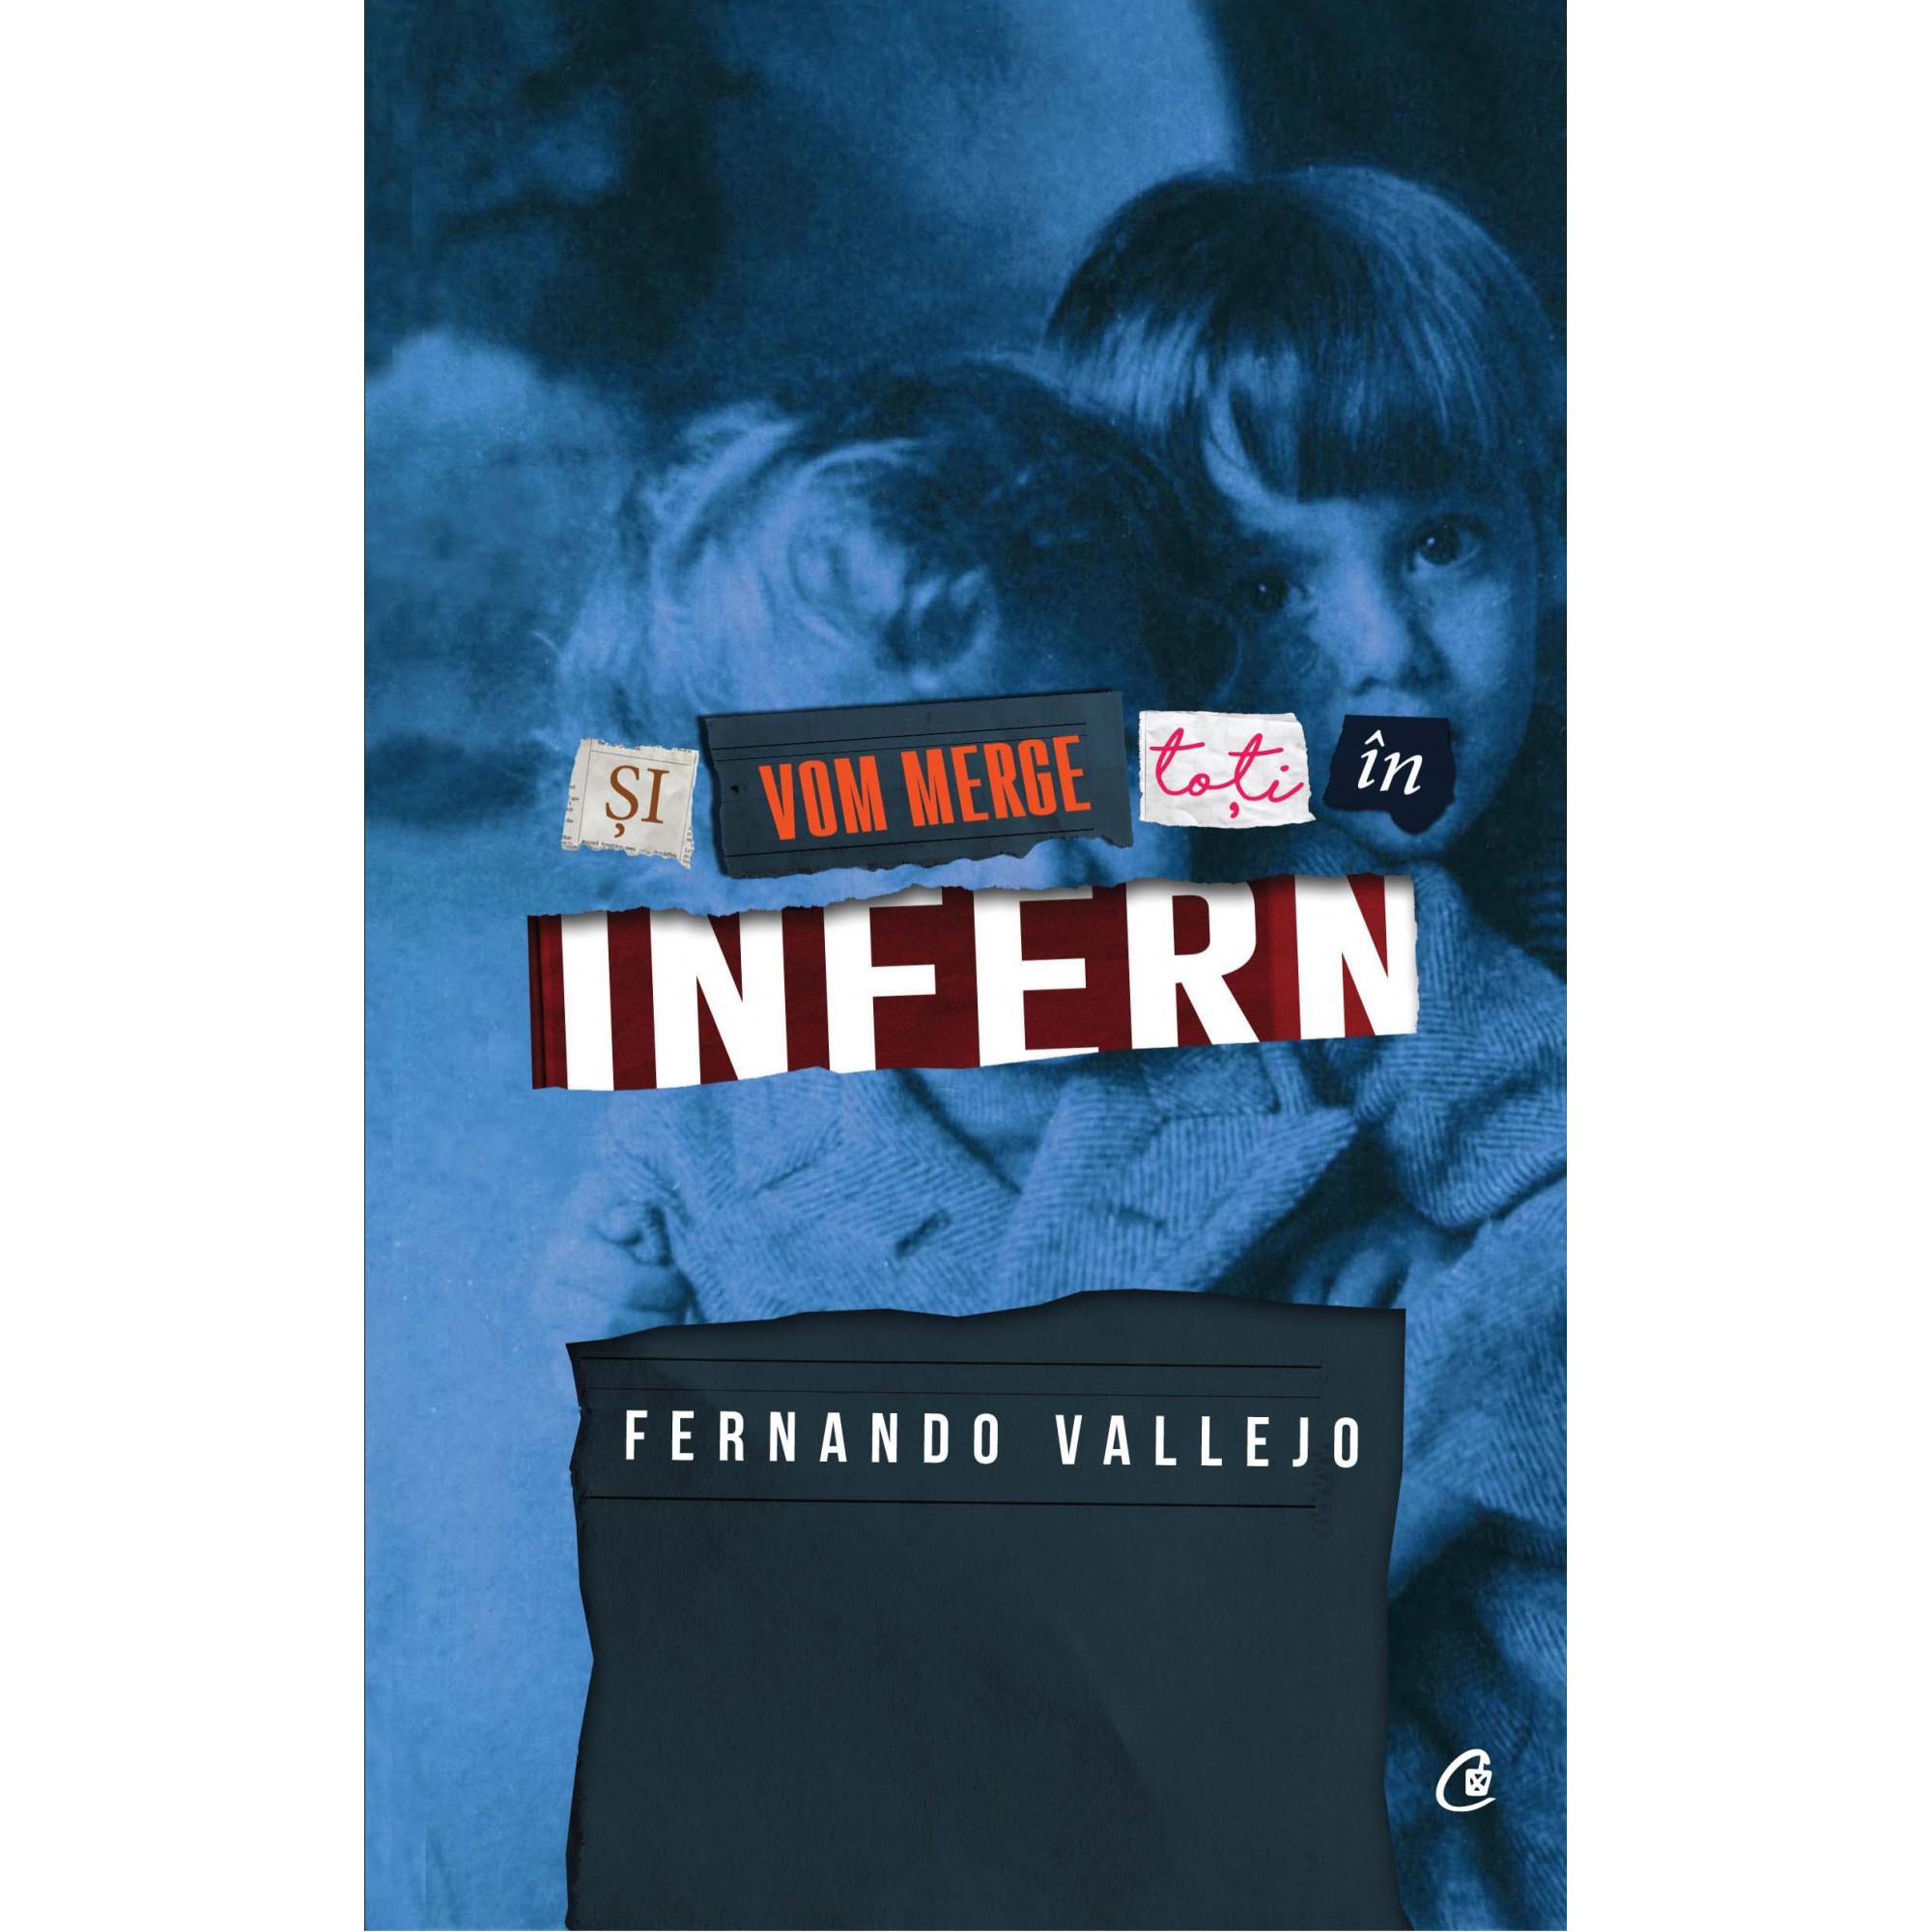 Și vom merge toți în infern; Fernando Vallejo